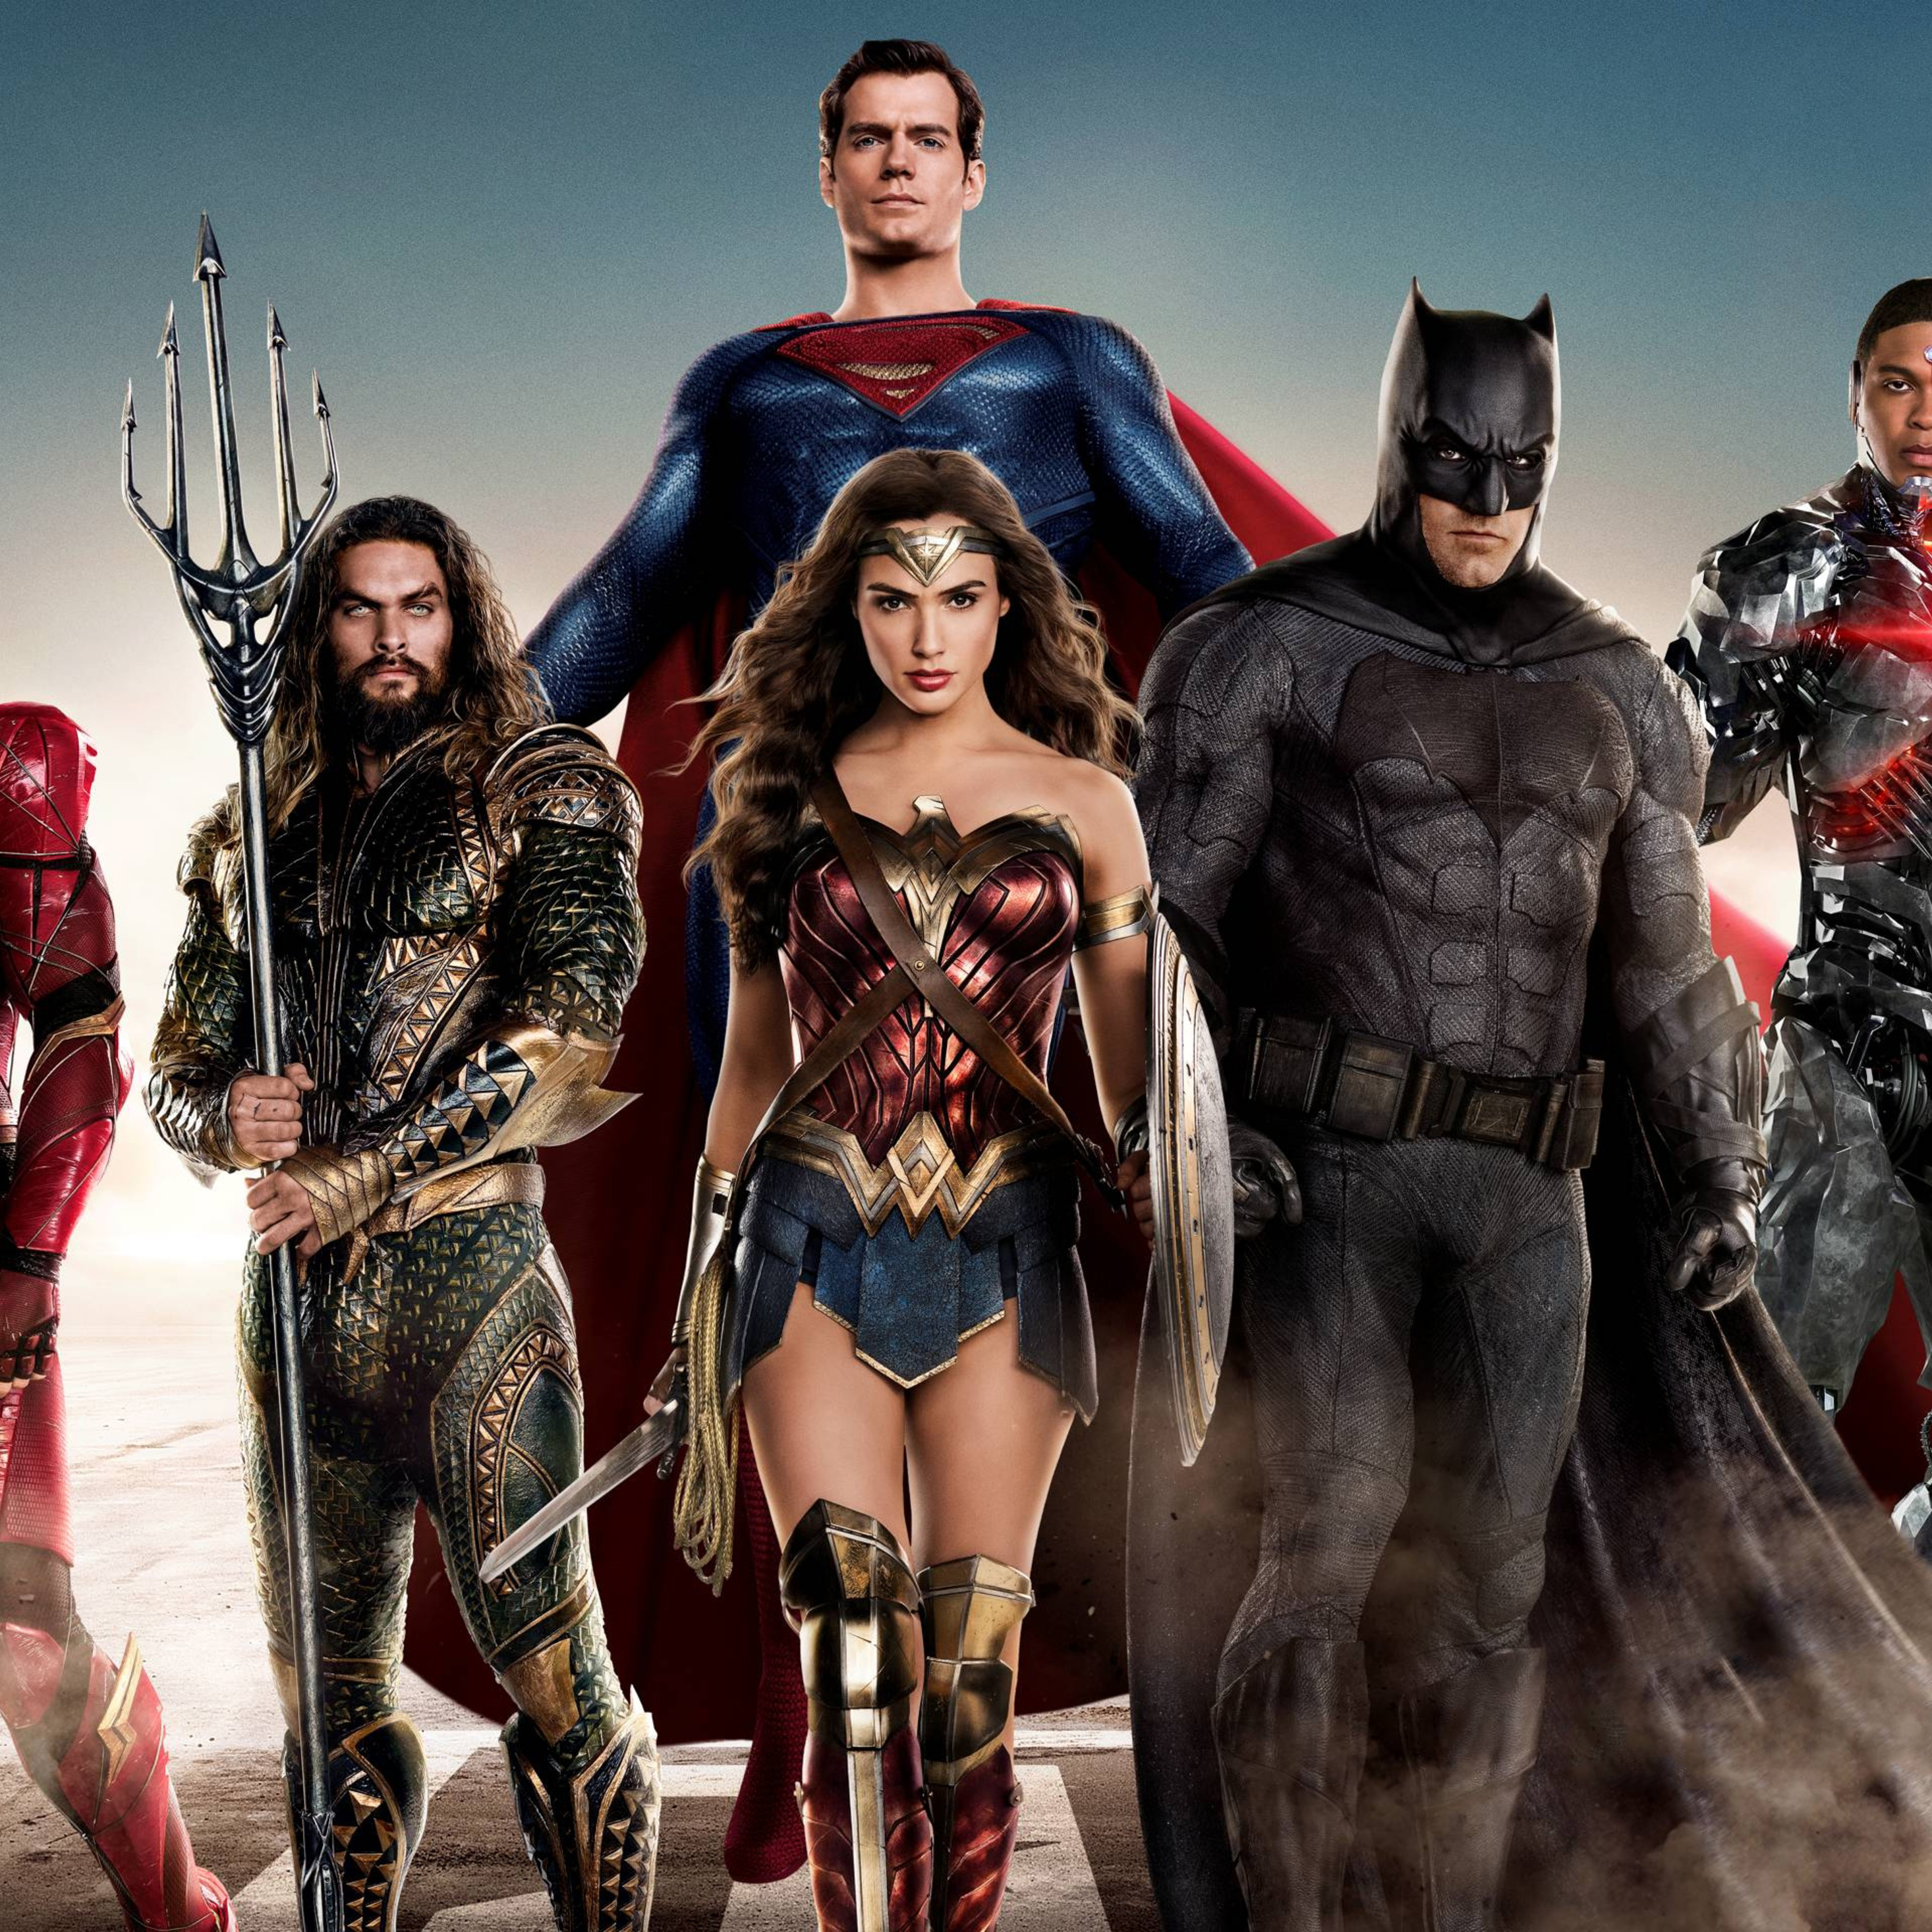 justice-league-2017-movie-poster-ev.jpg